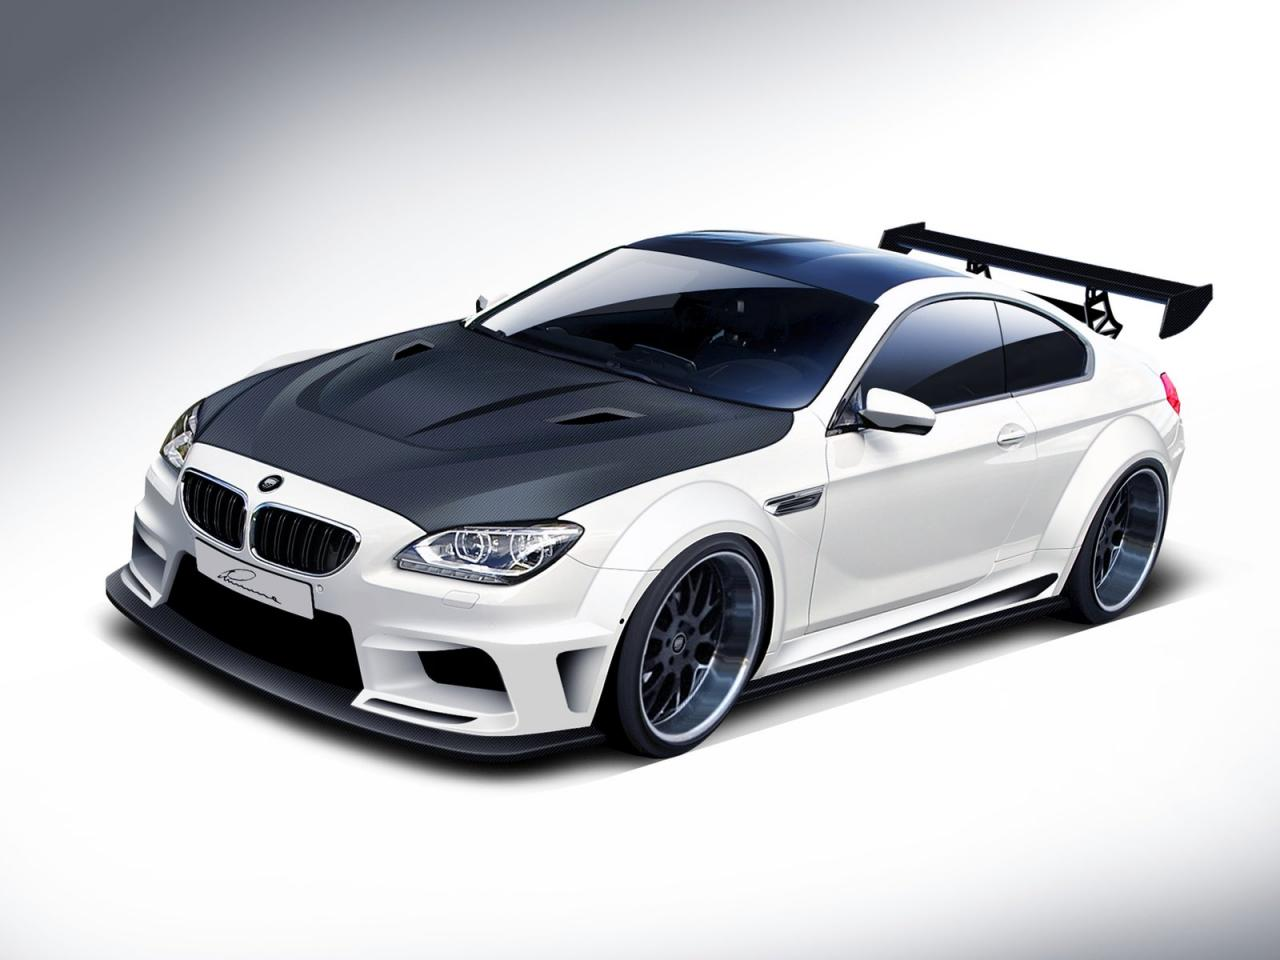 BMW CLR 6 M by Lumma Design